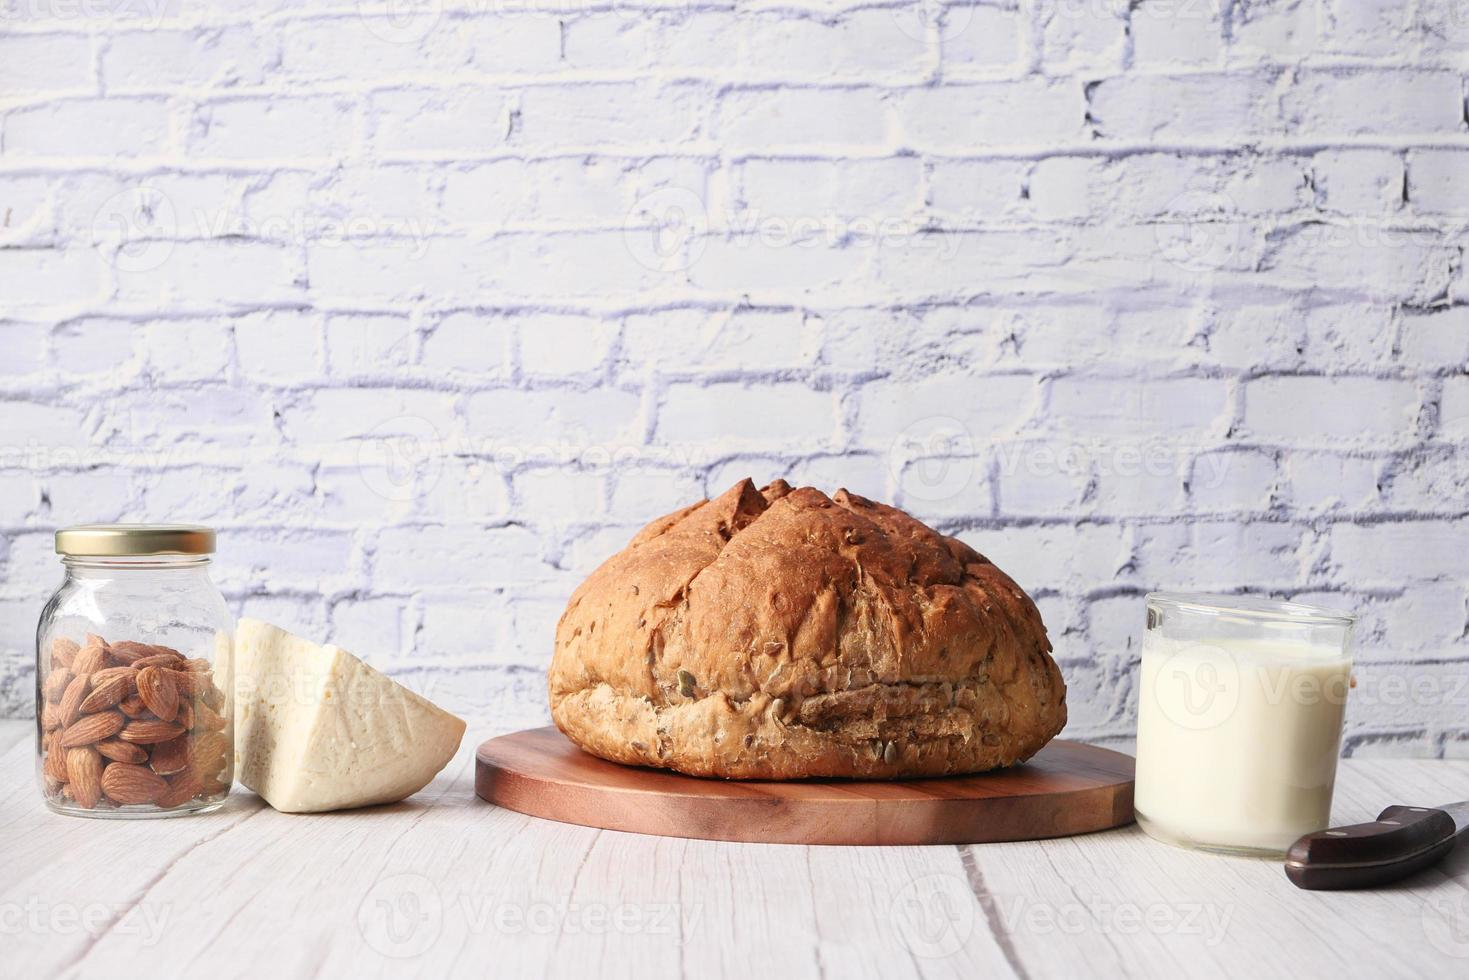 pan integral, queso y leche sobre fondo neutro foto